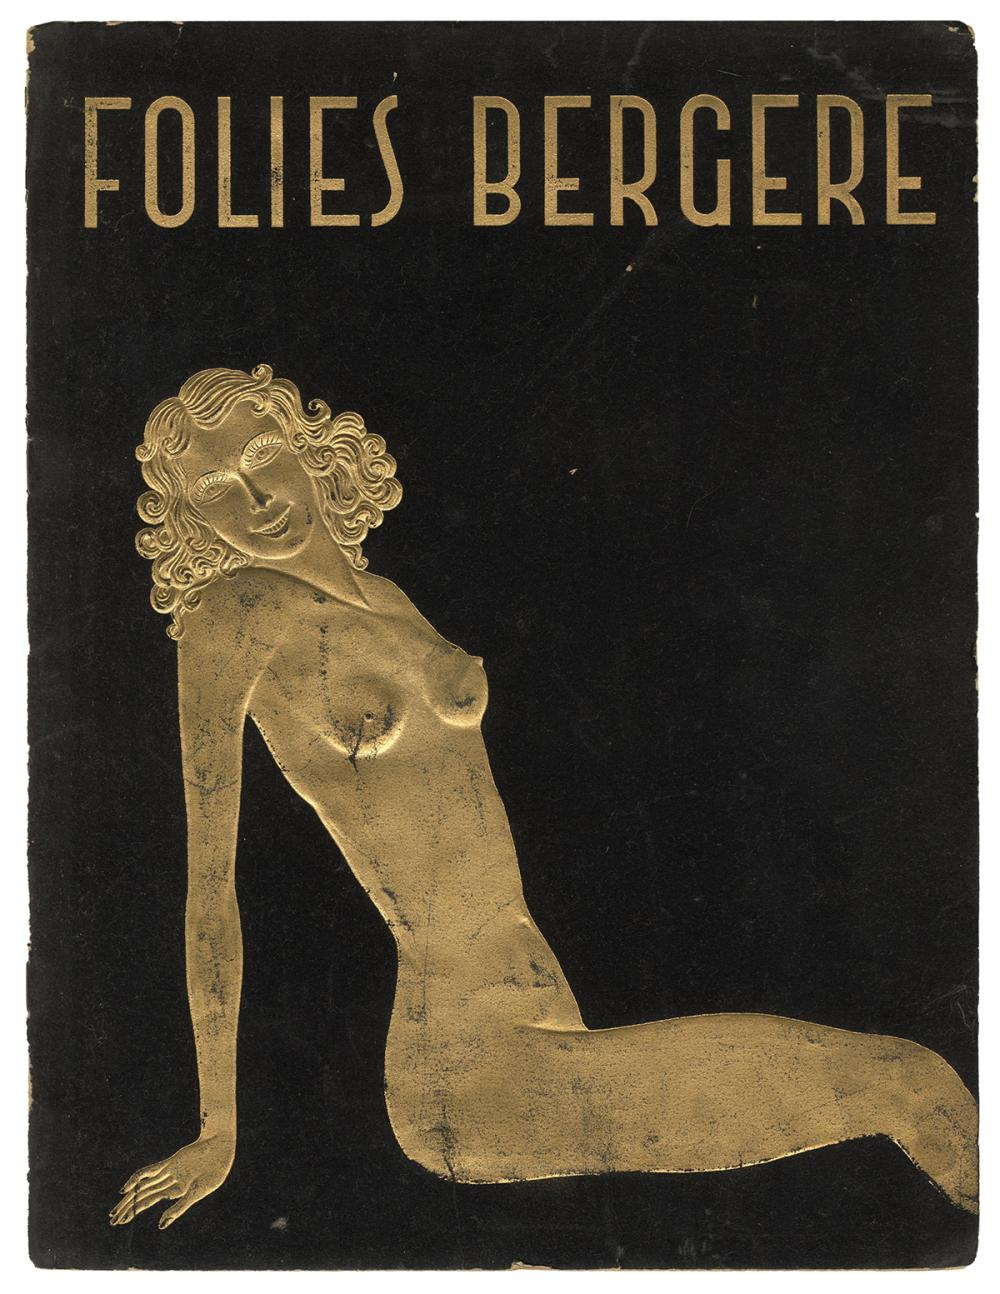 FOLIES BERGERE PROGRAM. PARIS, CA. 1930S. BLACK VELVET COVE...